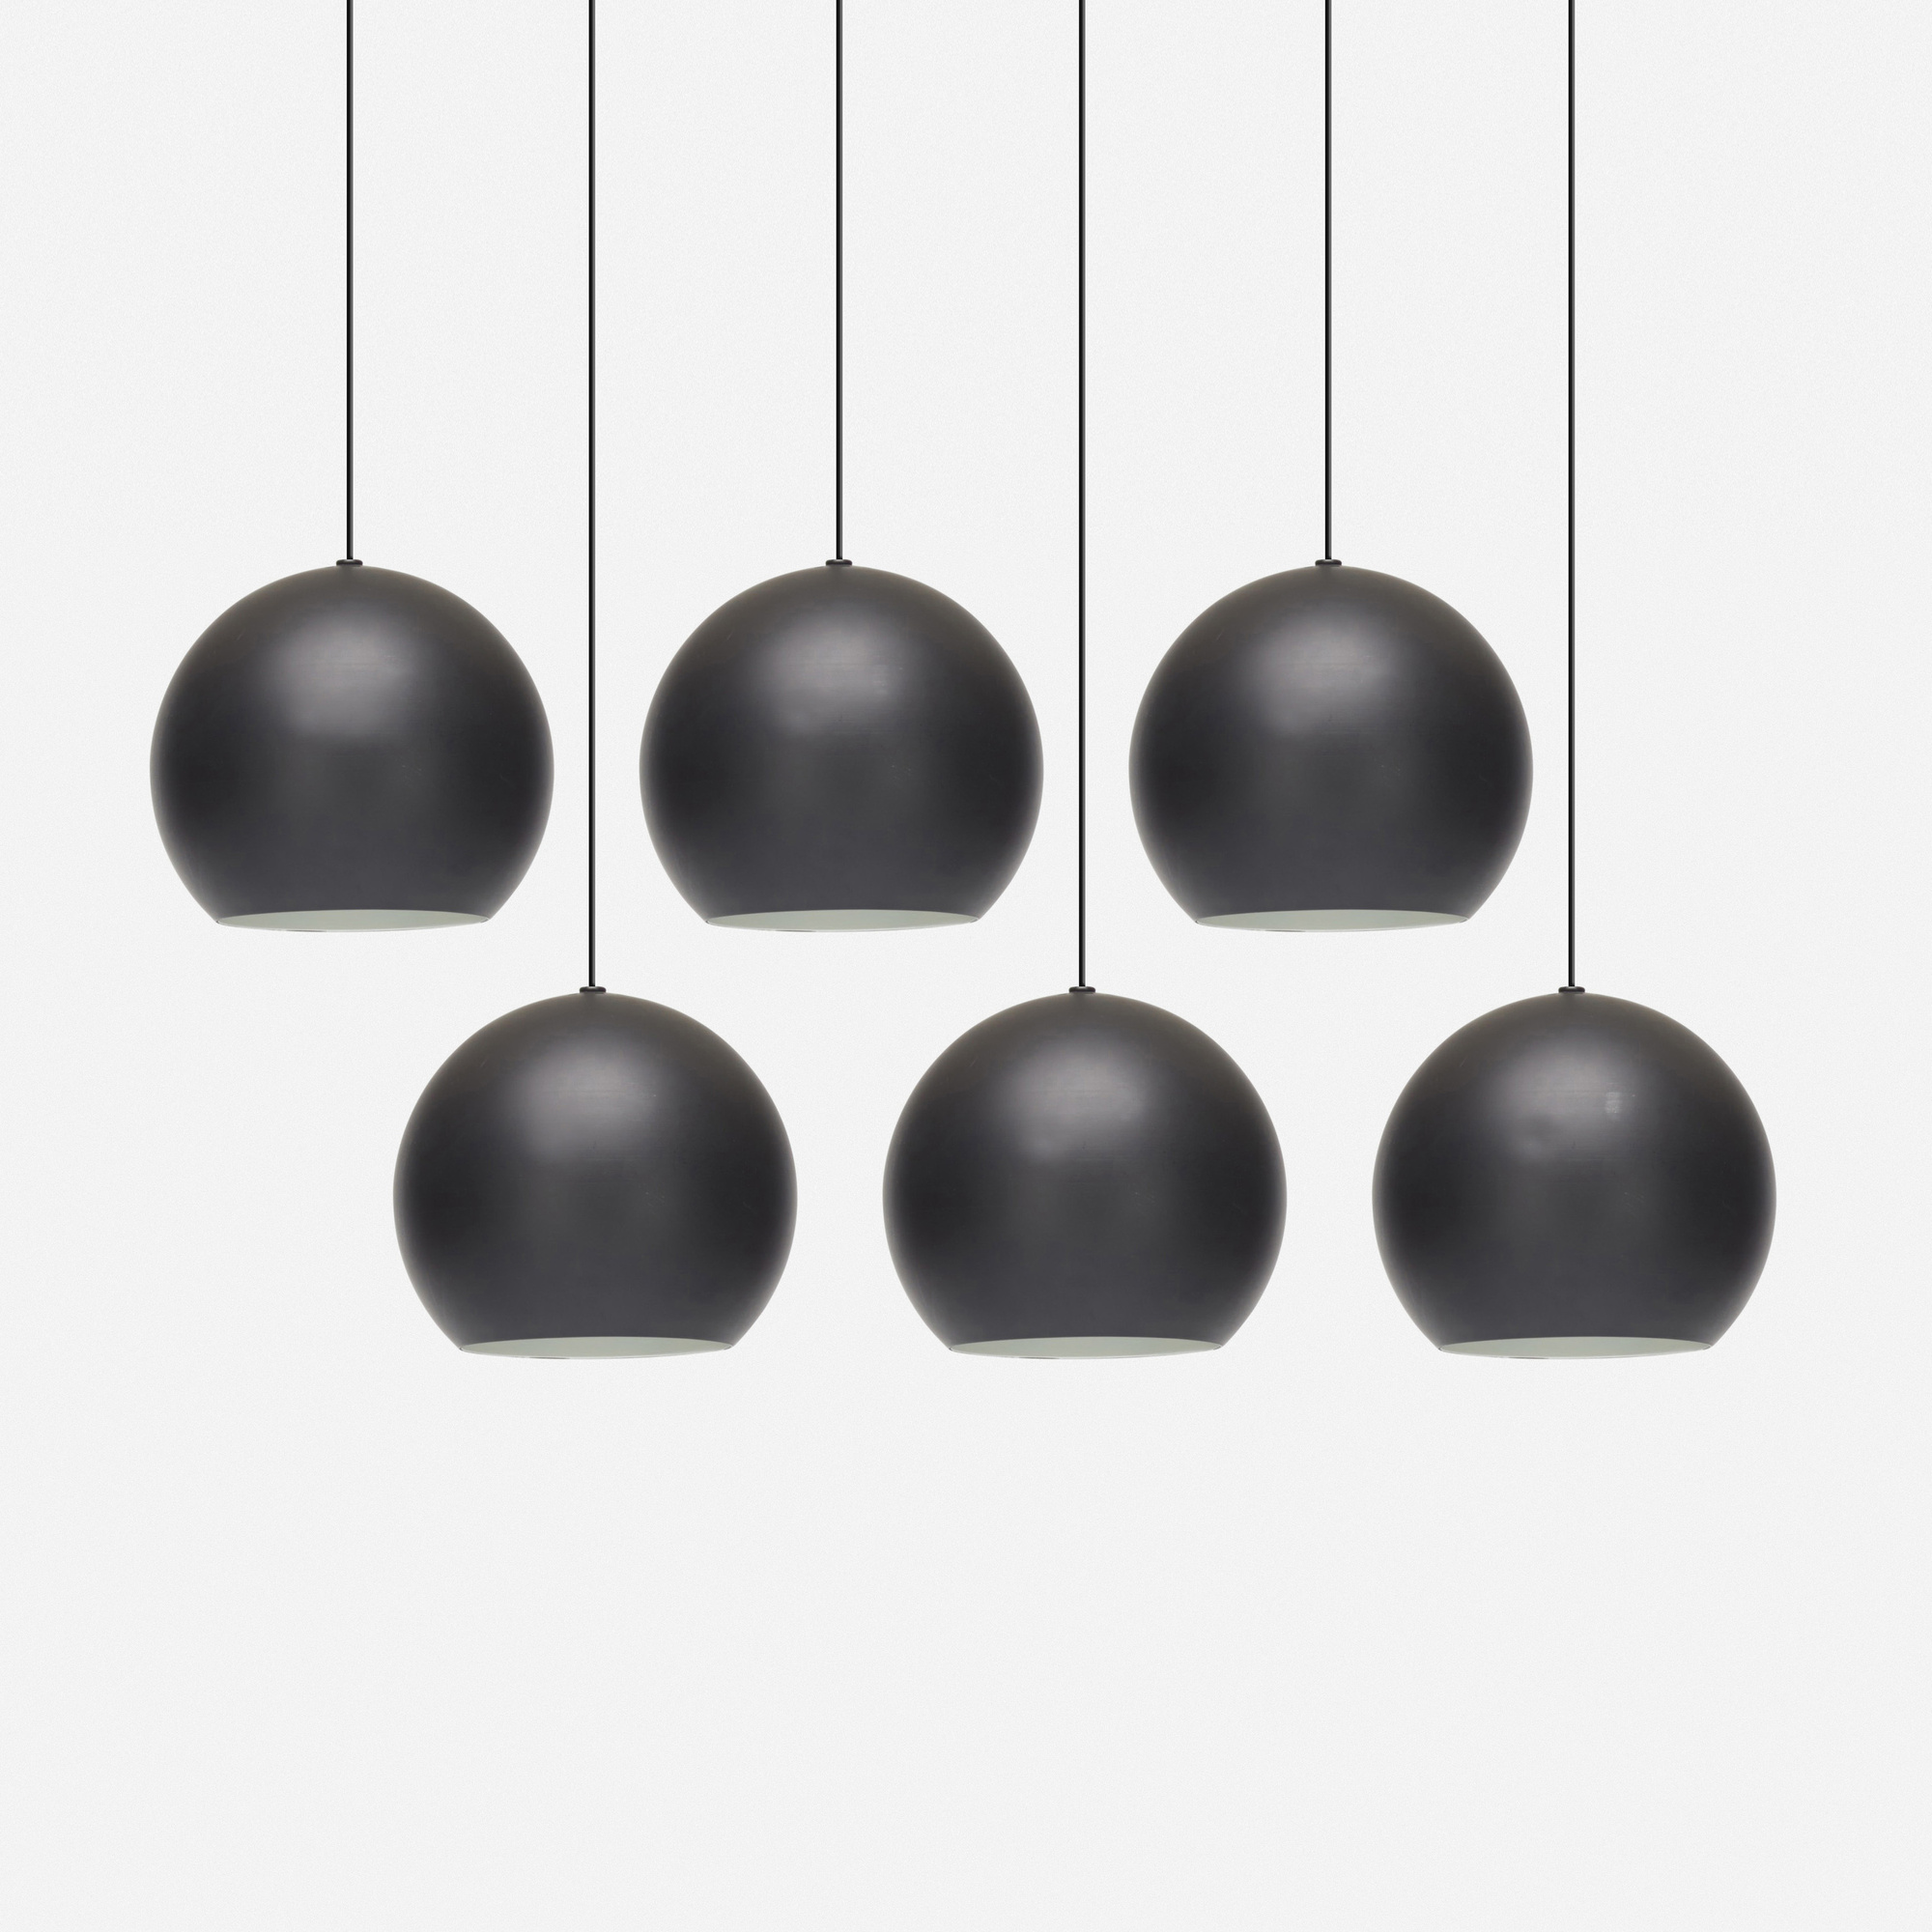 743: Stilnovo / pendant lamps, set of six (1 of 1)